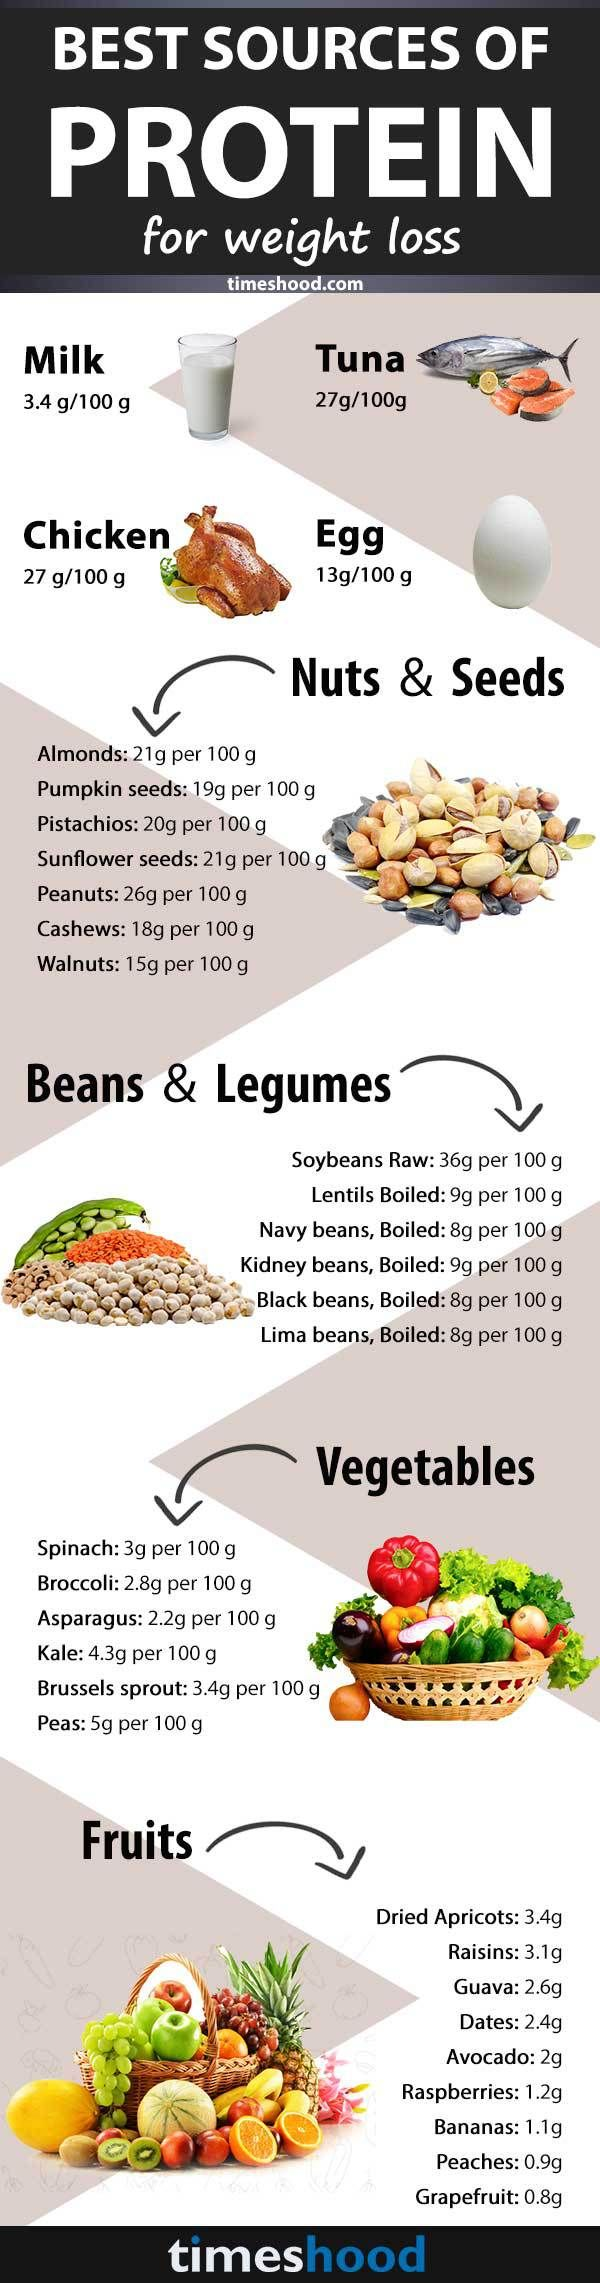 Squats Reduce Body Fat